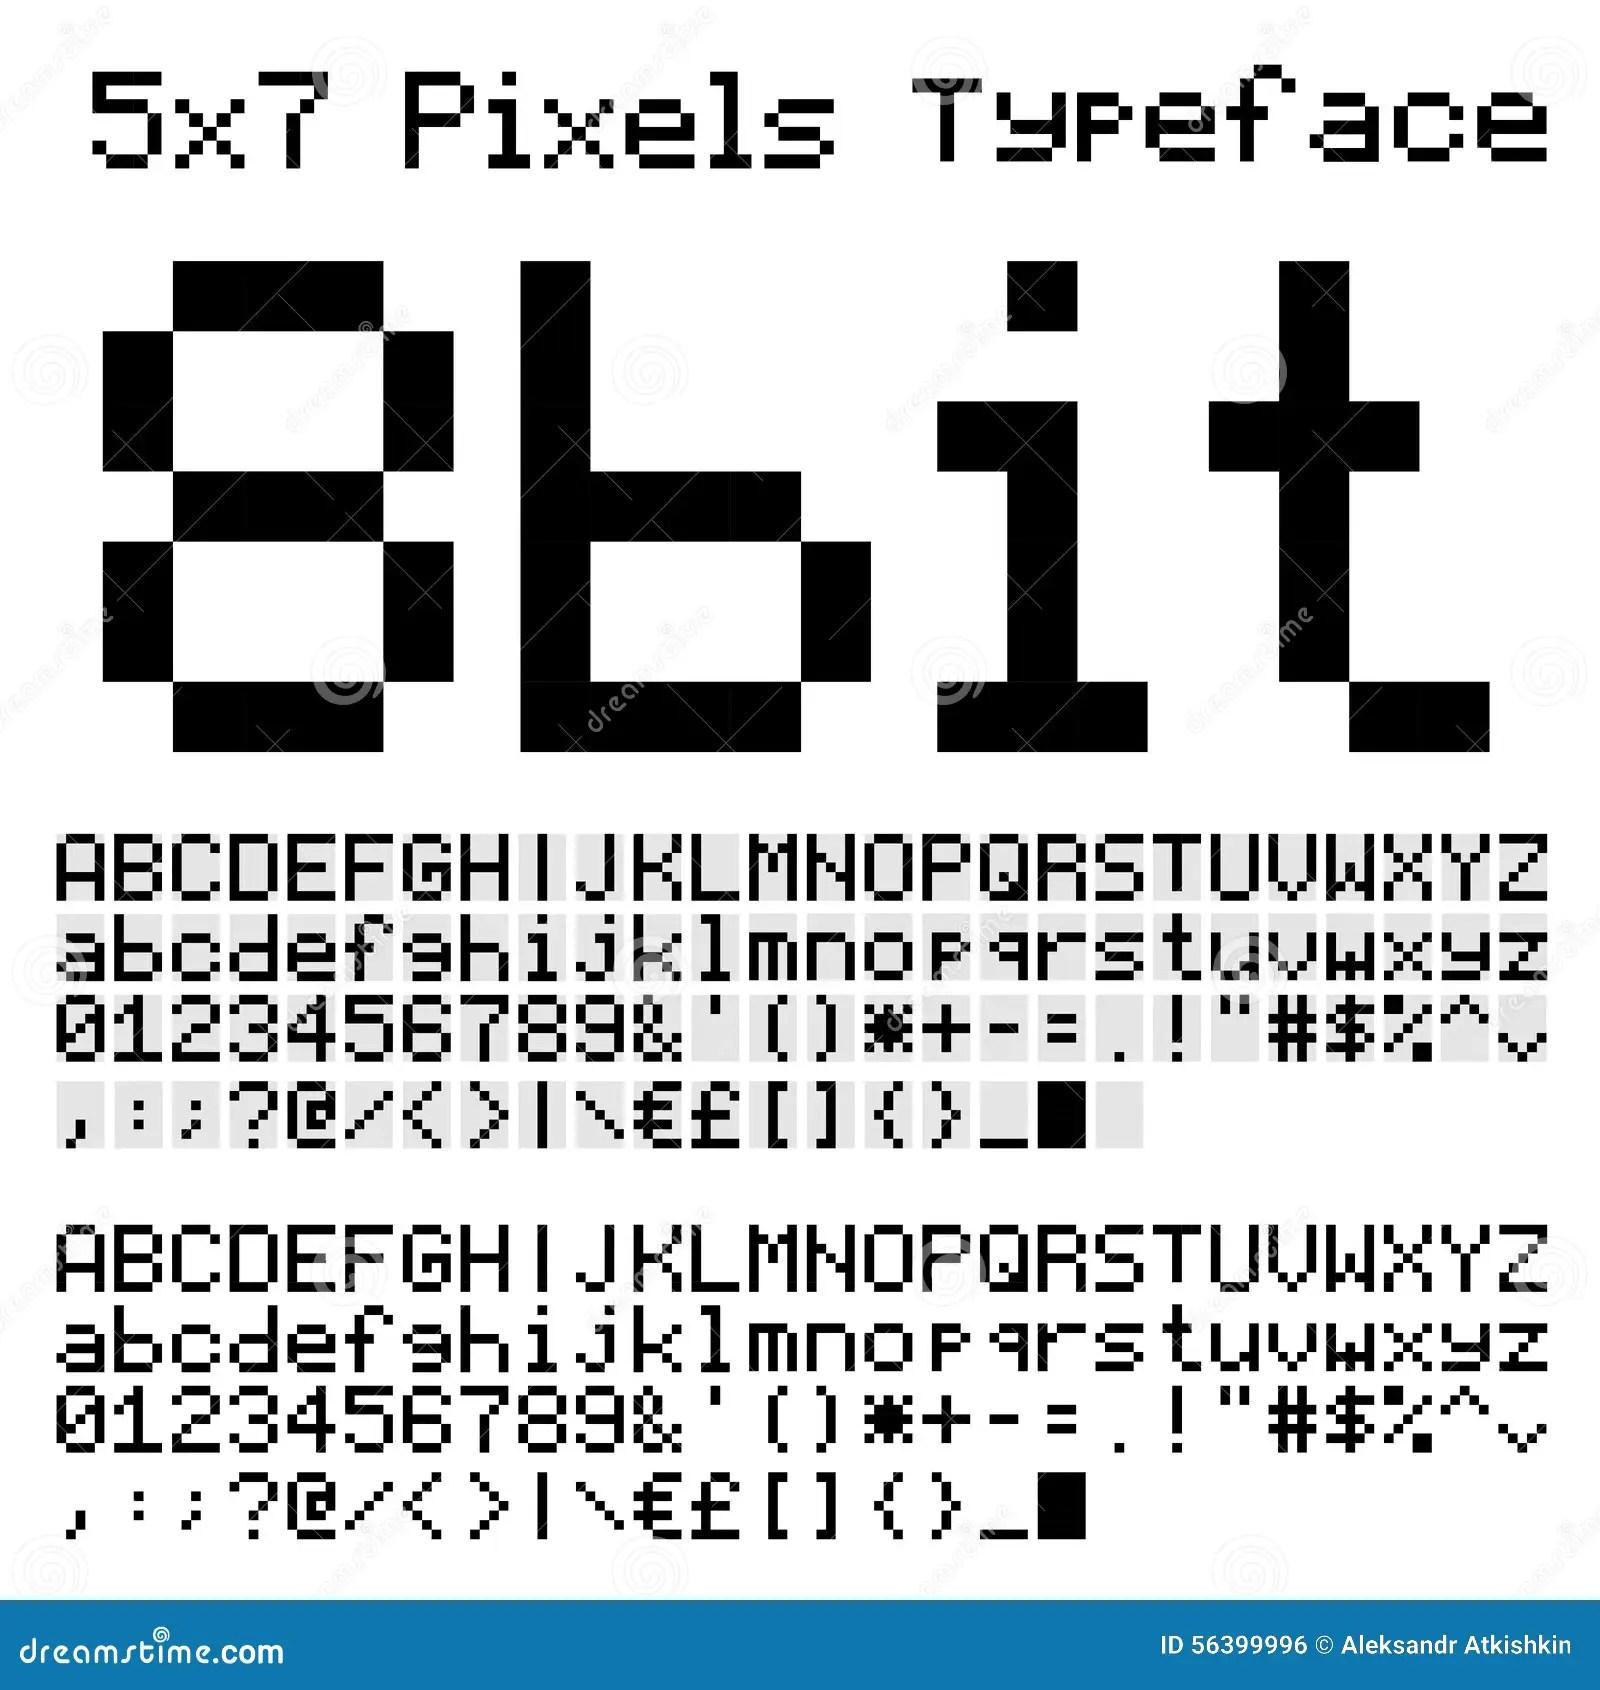 8 Bit Font Stock Vector Illustration Of Micro Gaming